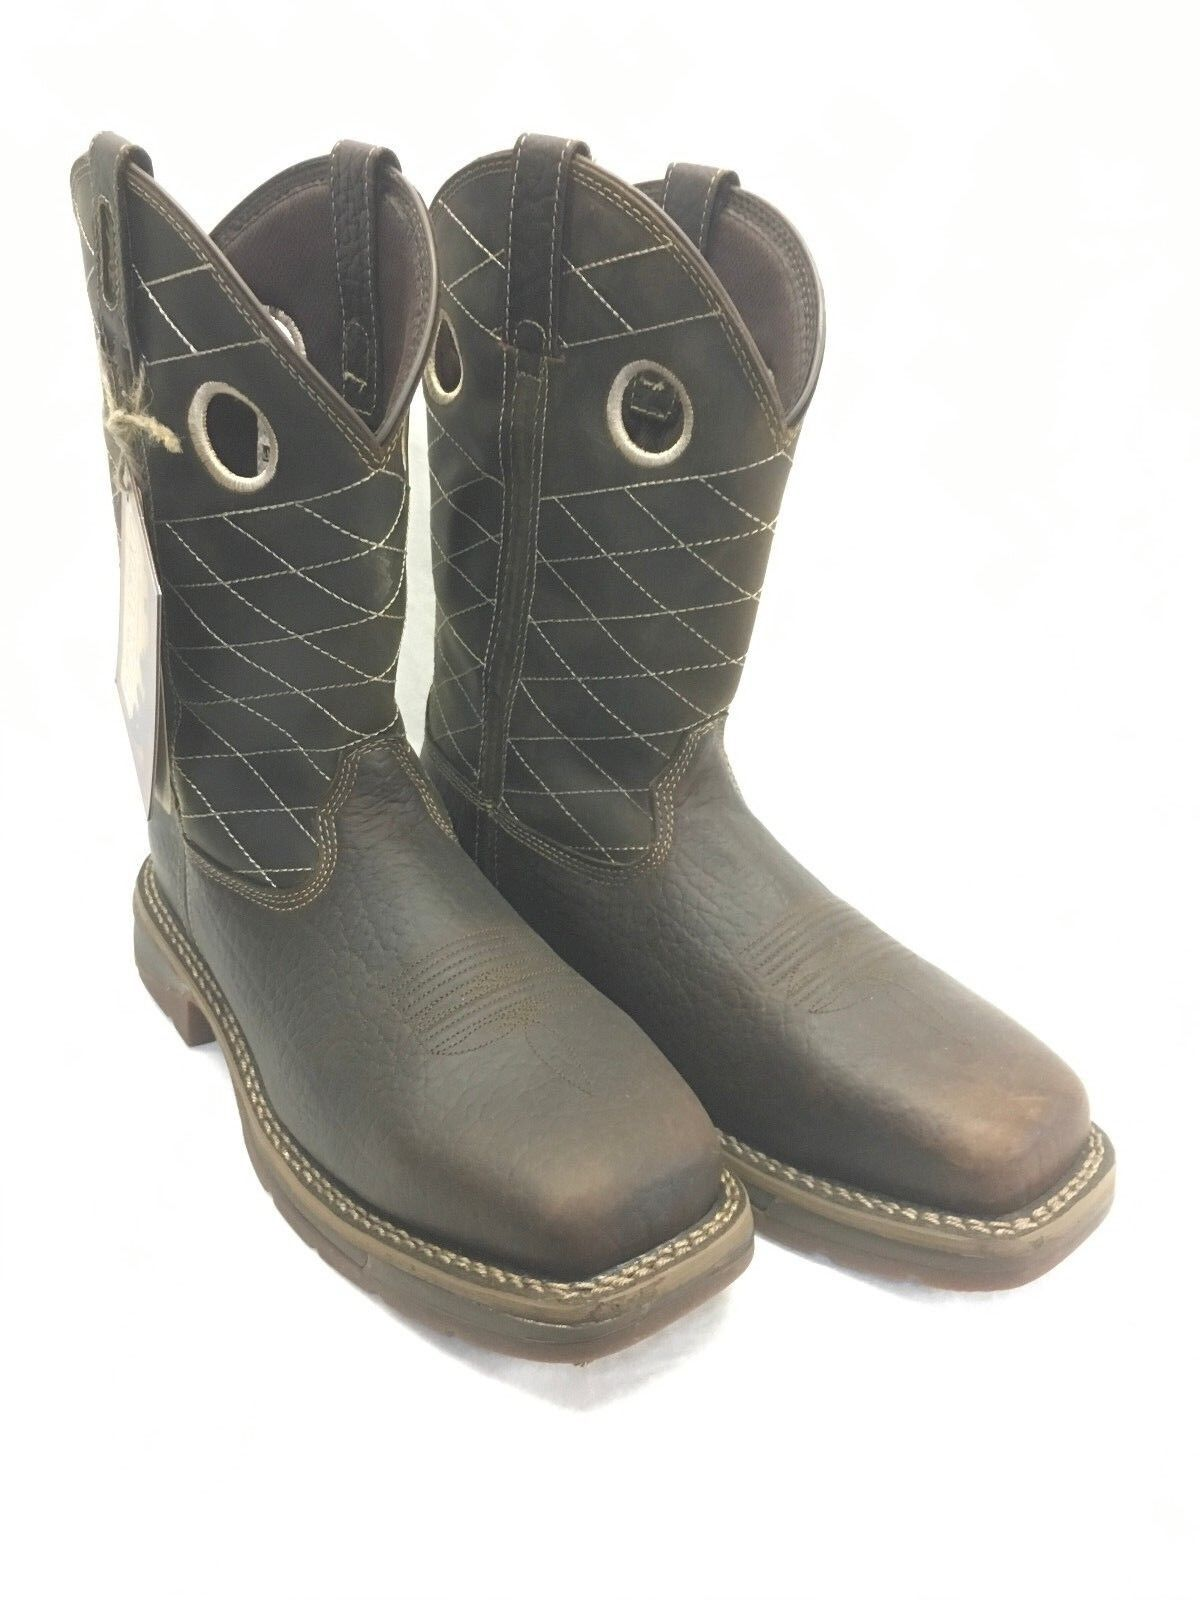 Men's Durango Composite Toe Western Work Boots, Style DB4354